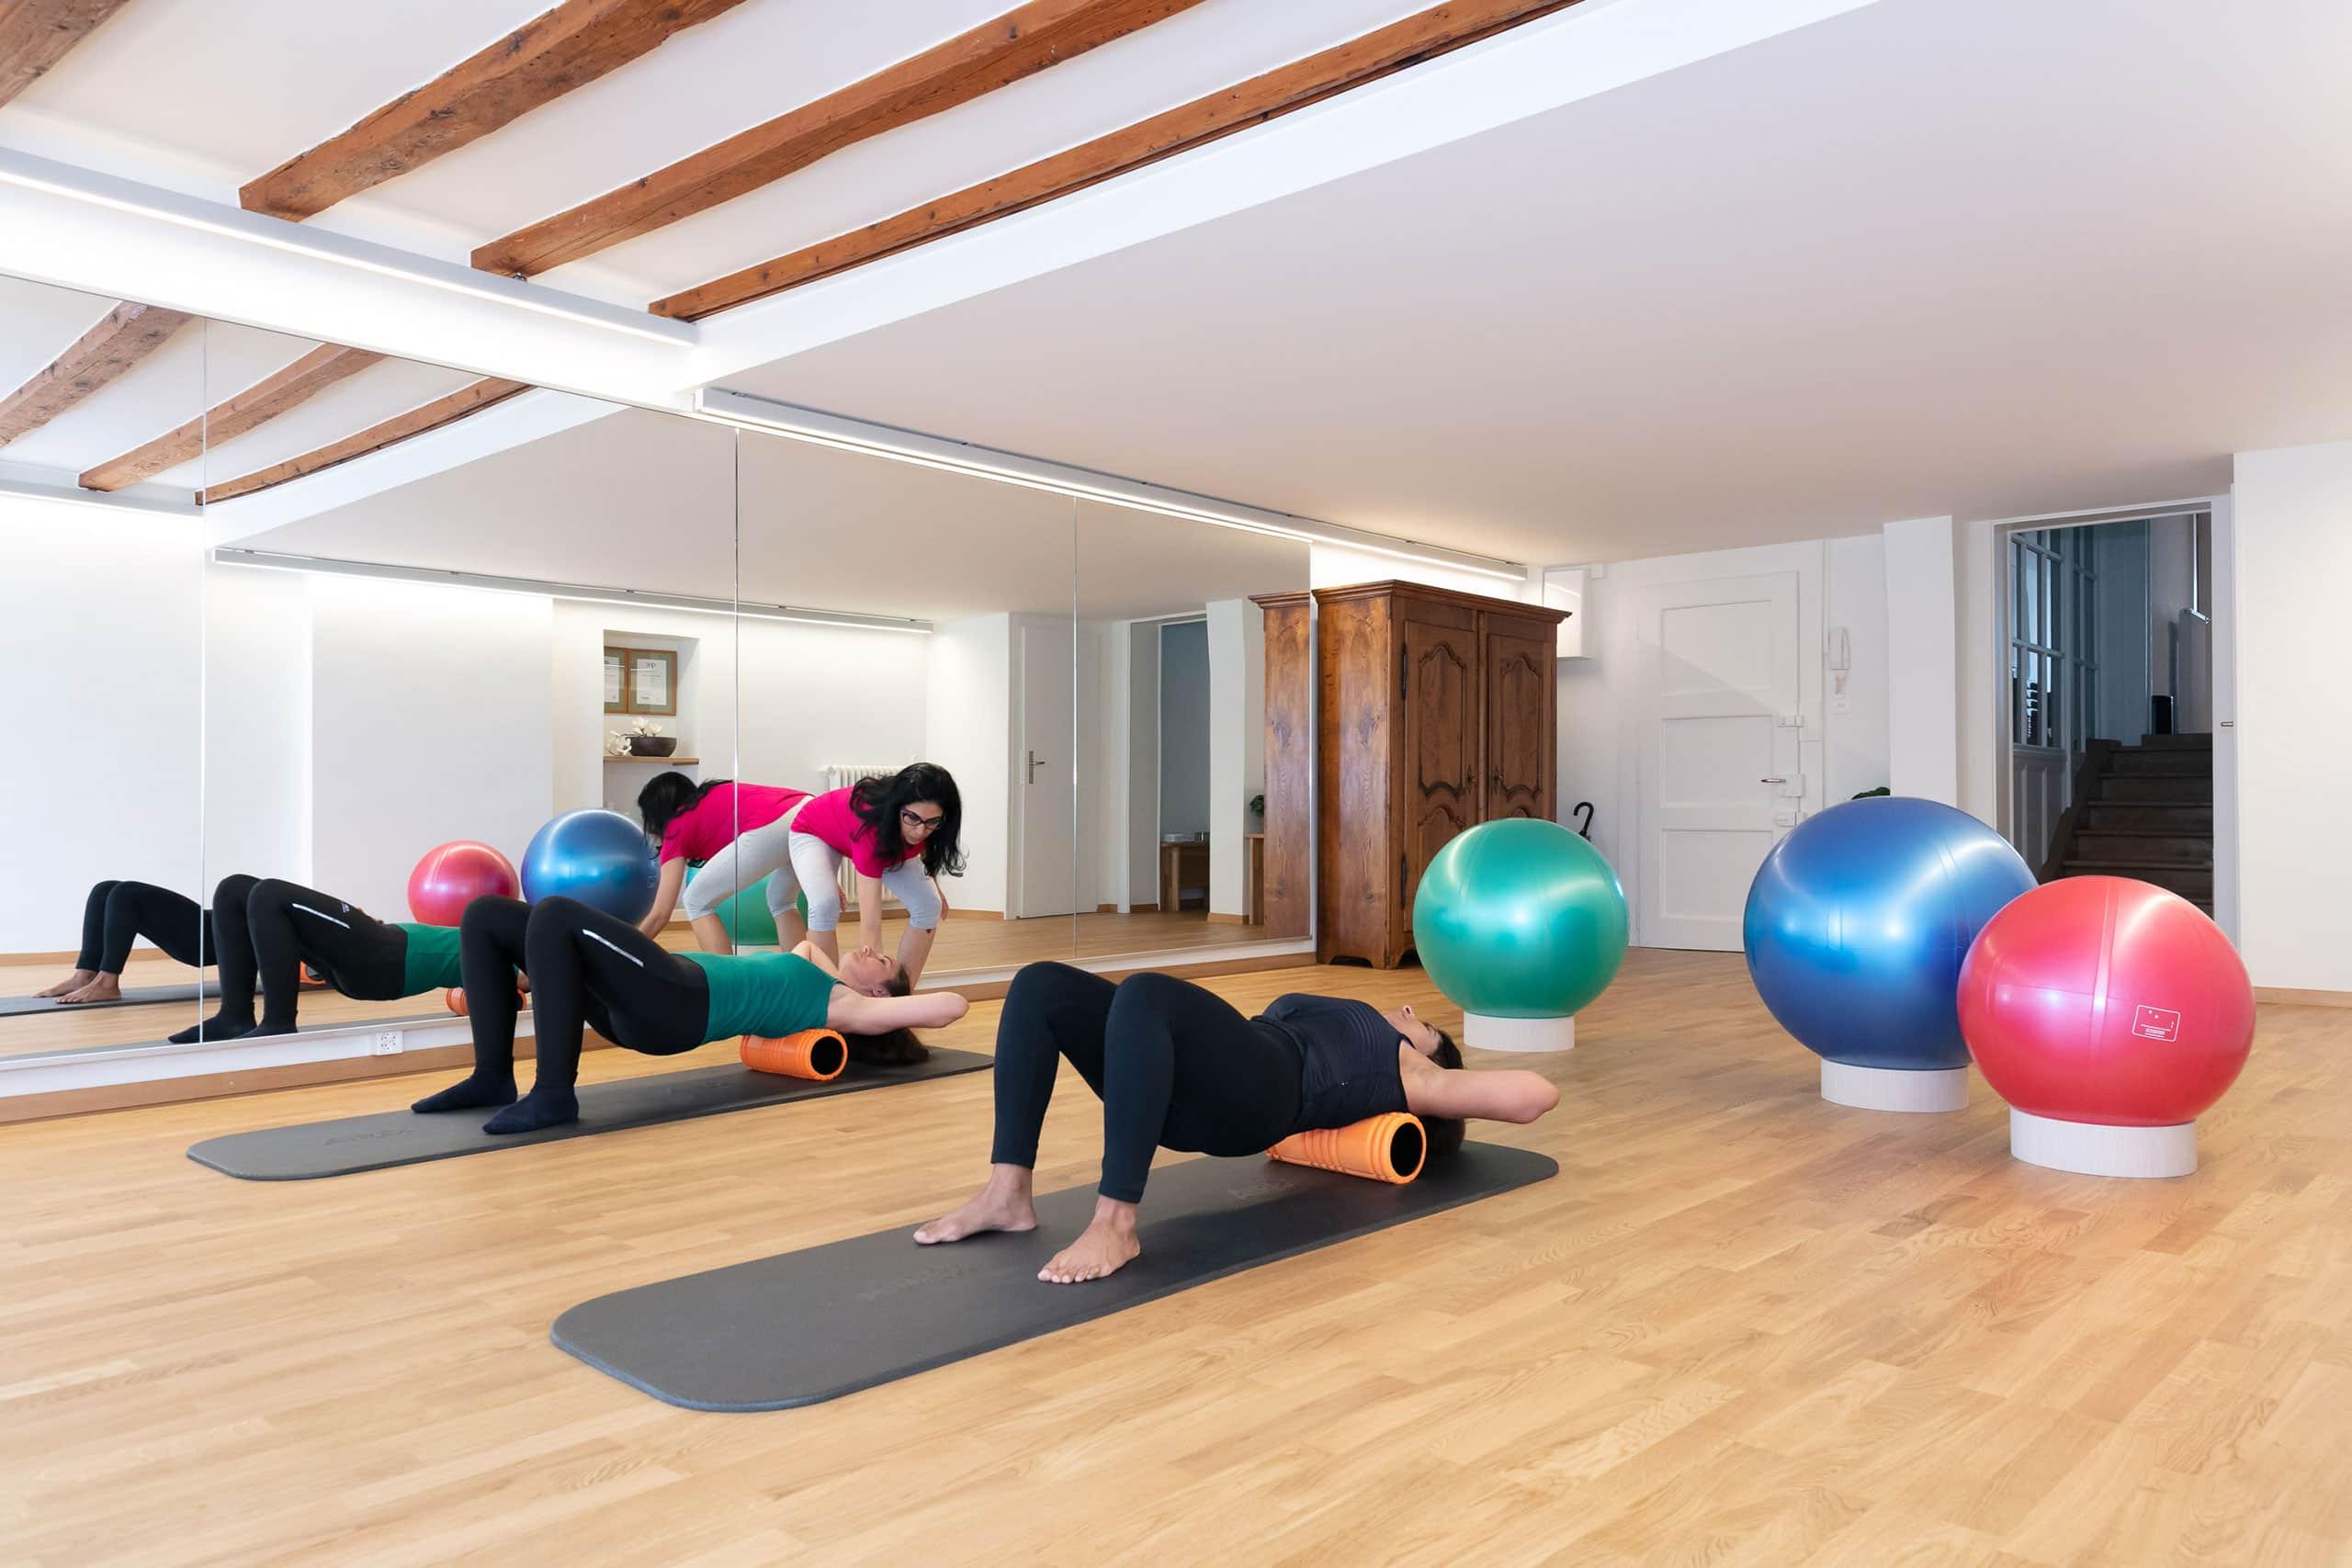 Back neck & abdominals - Training